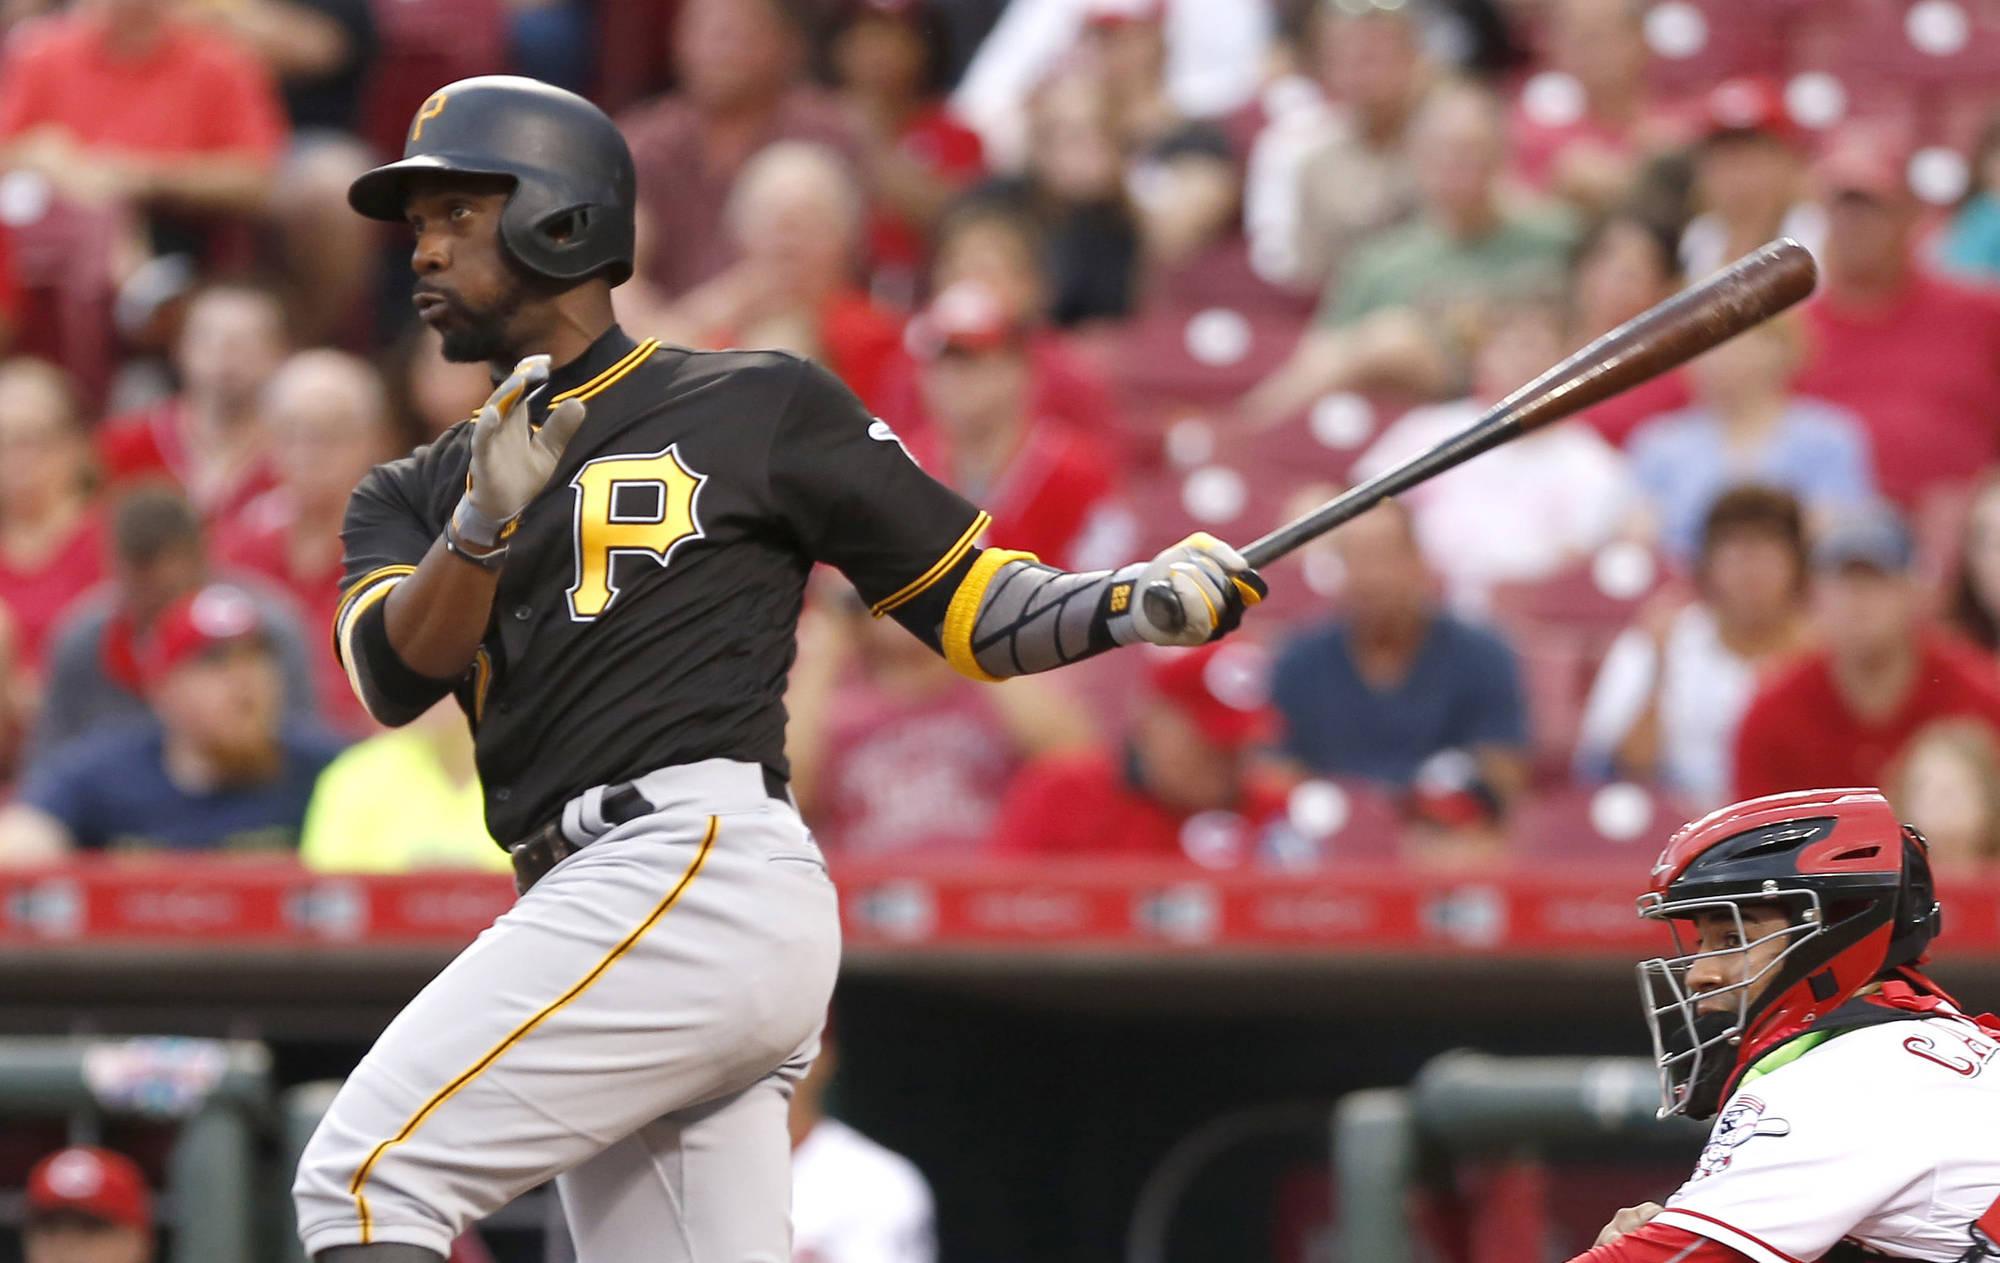 MLB Hot Stove: Pirates Looking to Move McCutchen